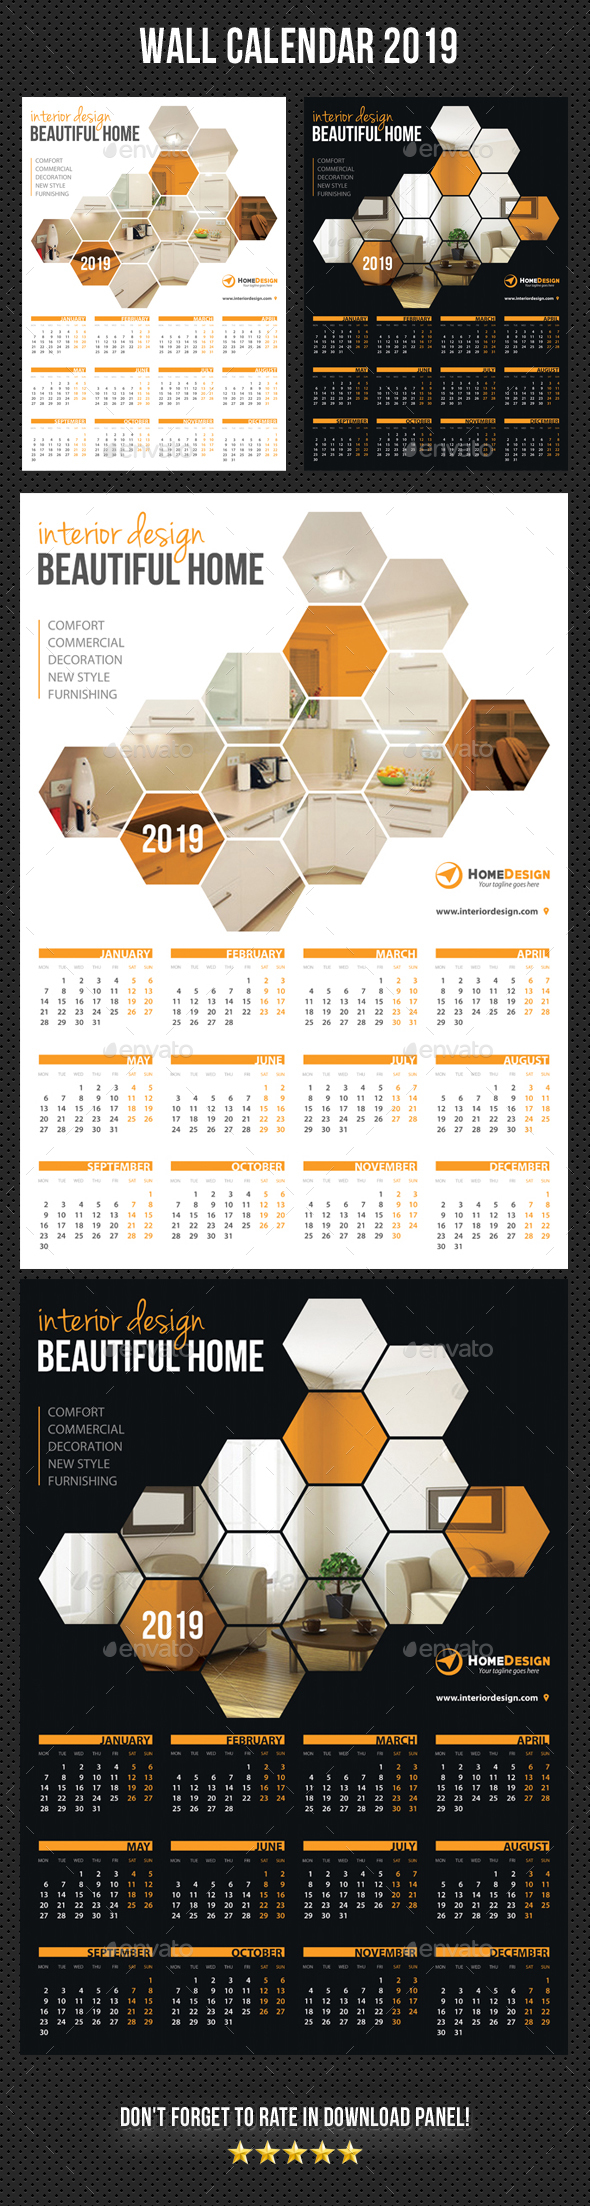 Wall Calendar 2019 V04 - Calendars Stationery